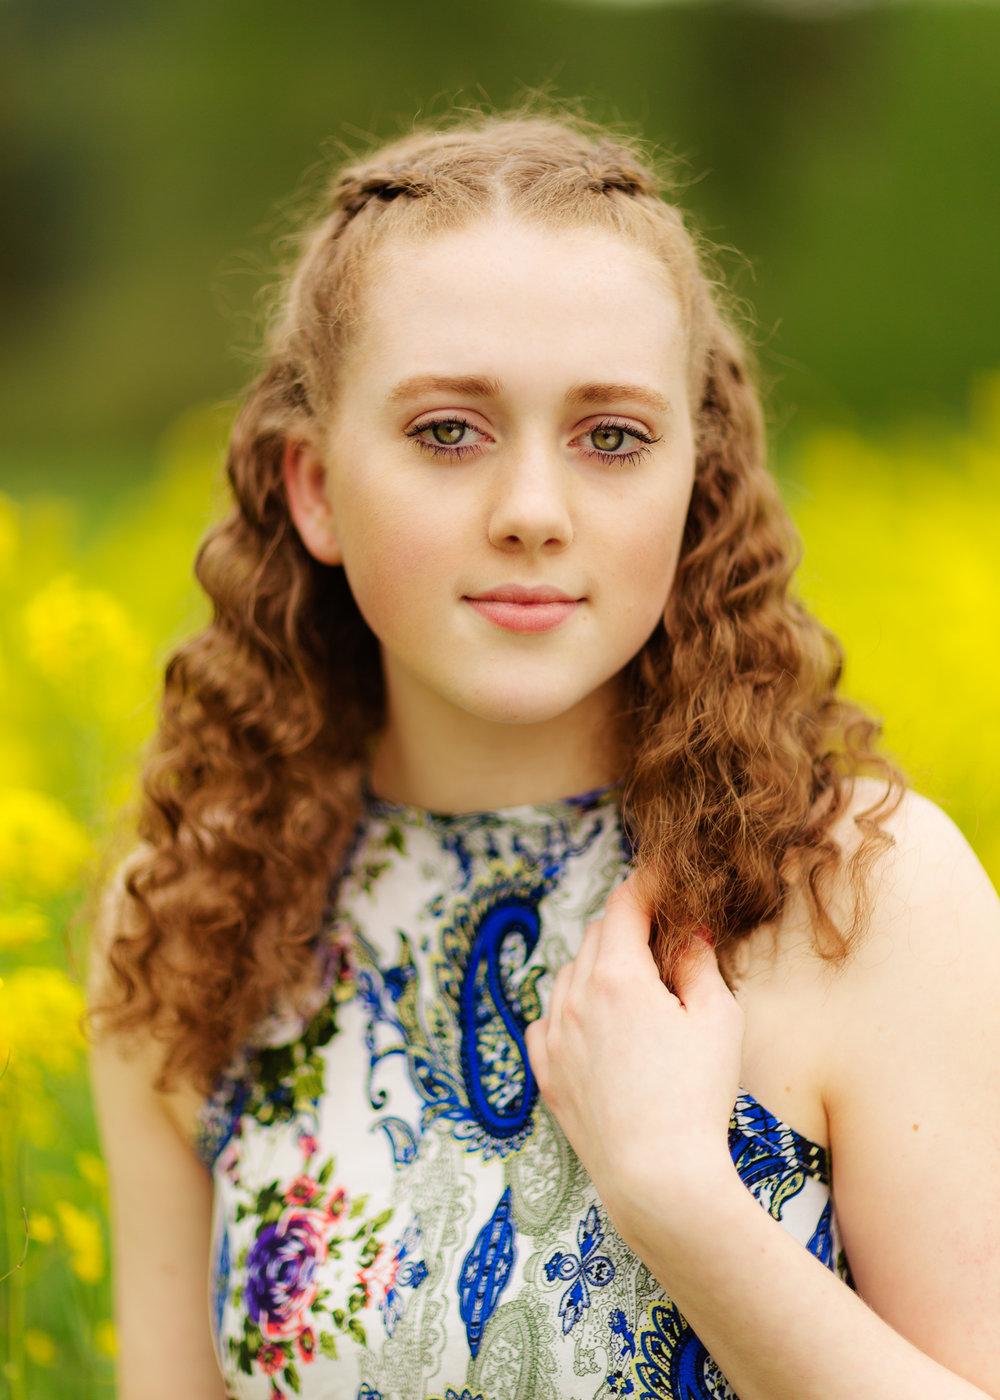 kaylie-duvall-monroe-woodinville-carnation-area-senior-portrait-photographer-2-4.jpg